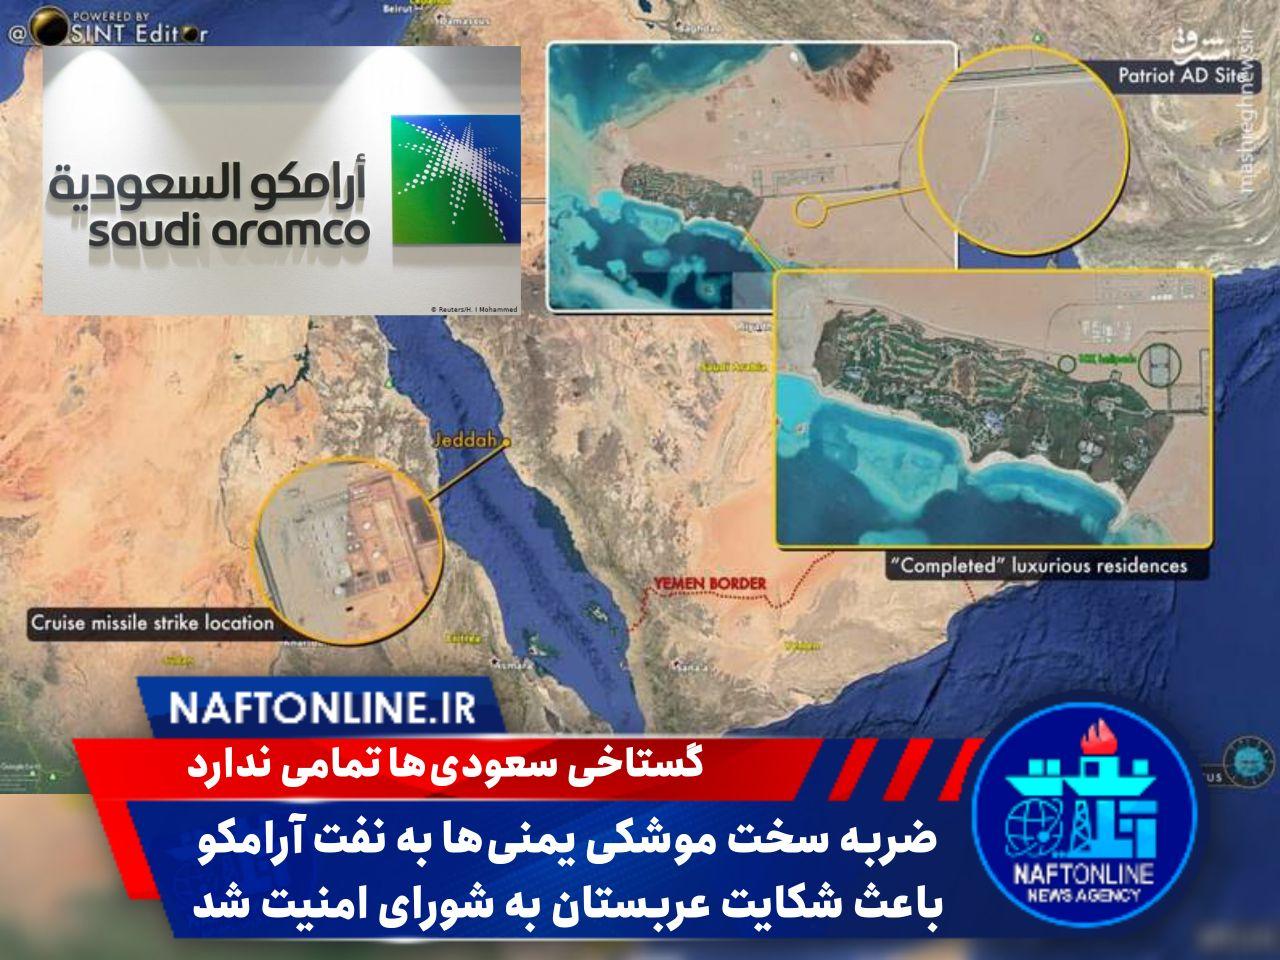 حمله یمن به تاسیسات نفتی آرامکو | نفت آنلاین